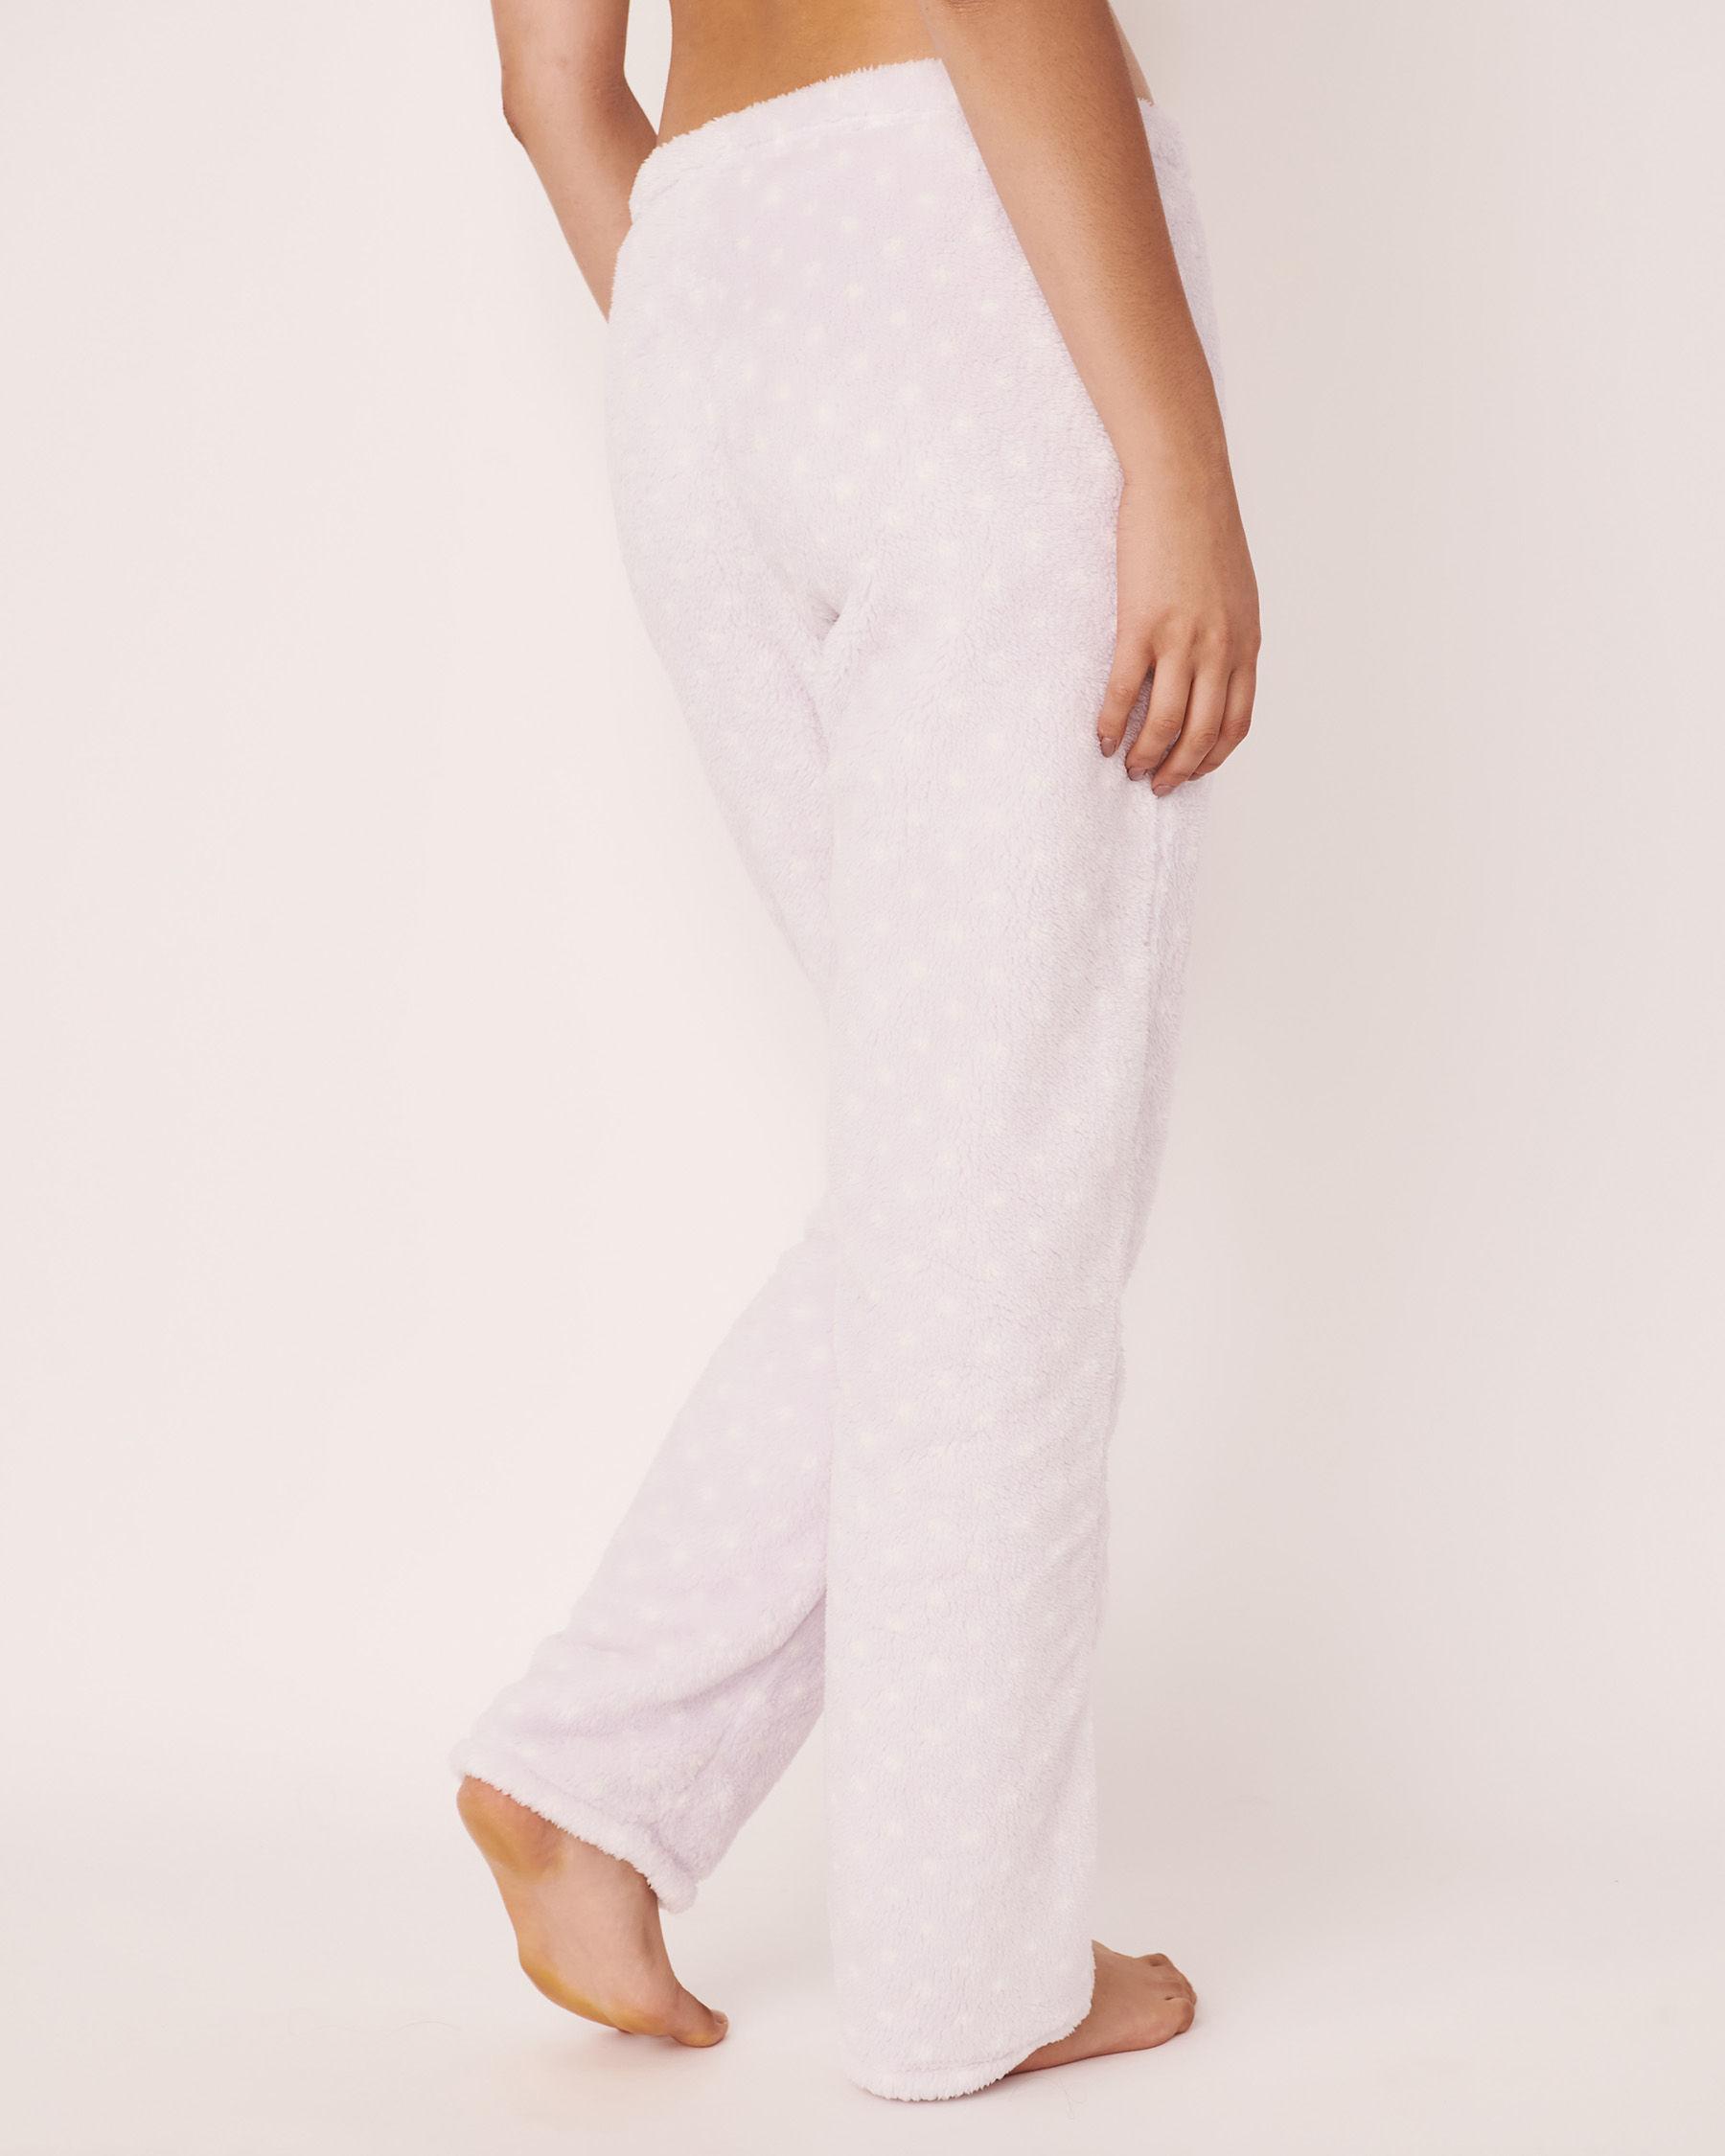 LA VIE EN ROSE Ensemble pyjama mouton 3D Blanc 40400009 - Voir5